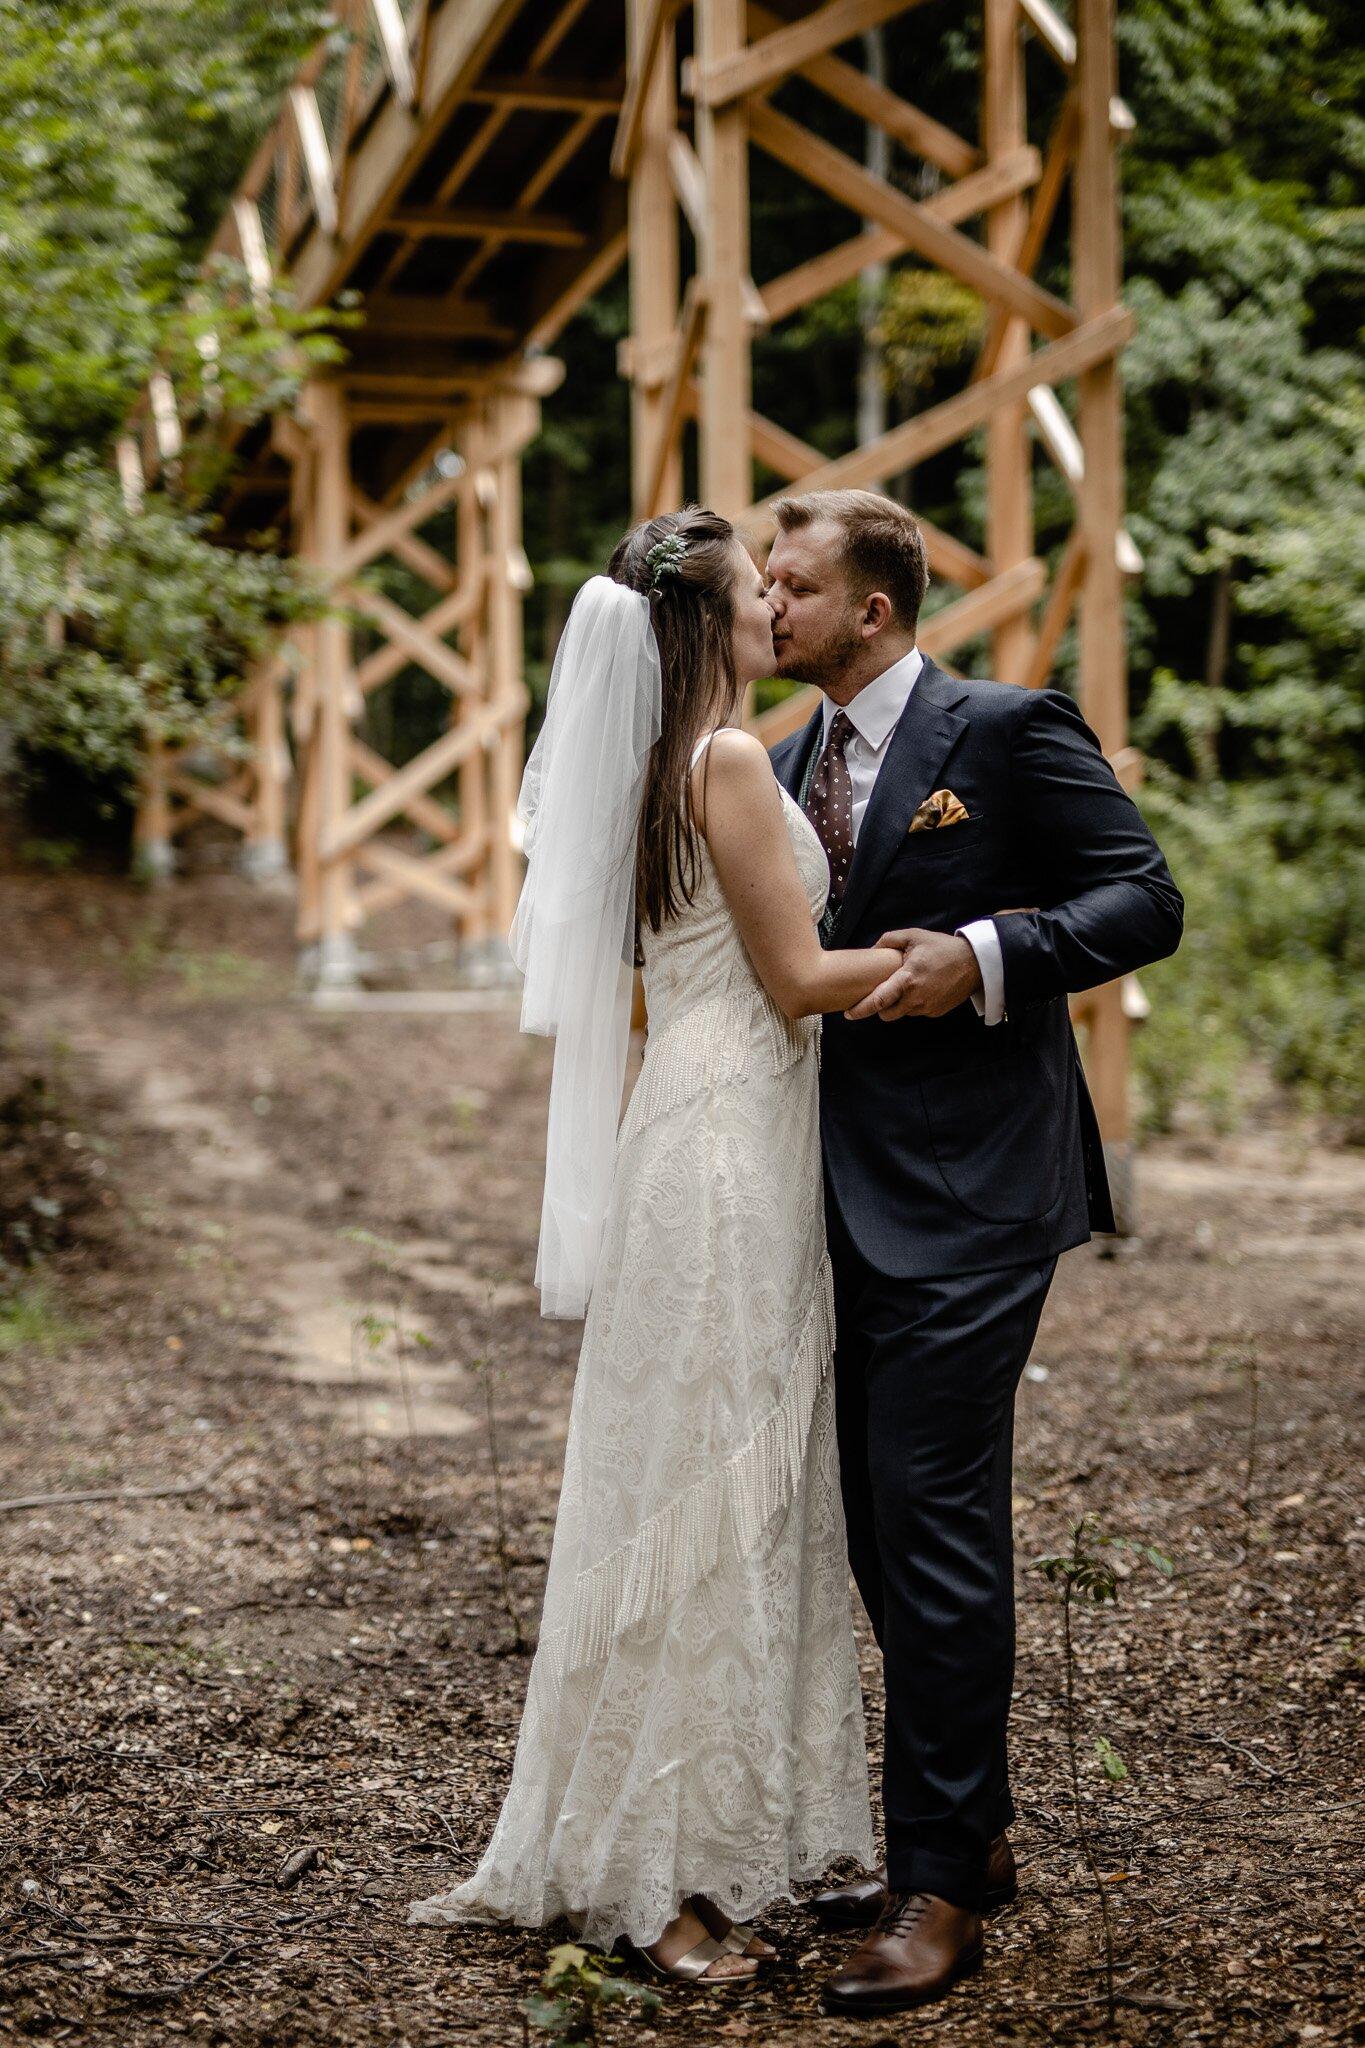 Sesja ślubna - Marta i Kuba - IMG_5938